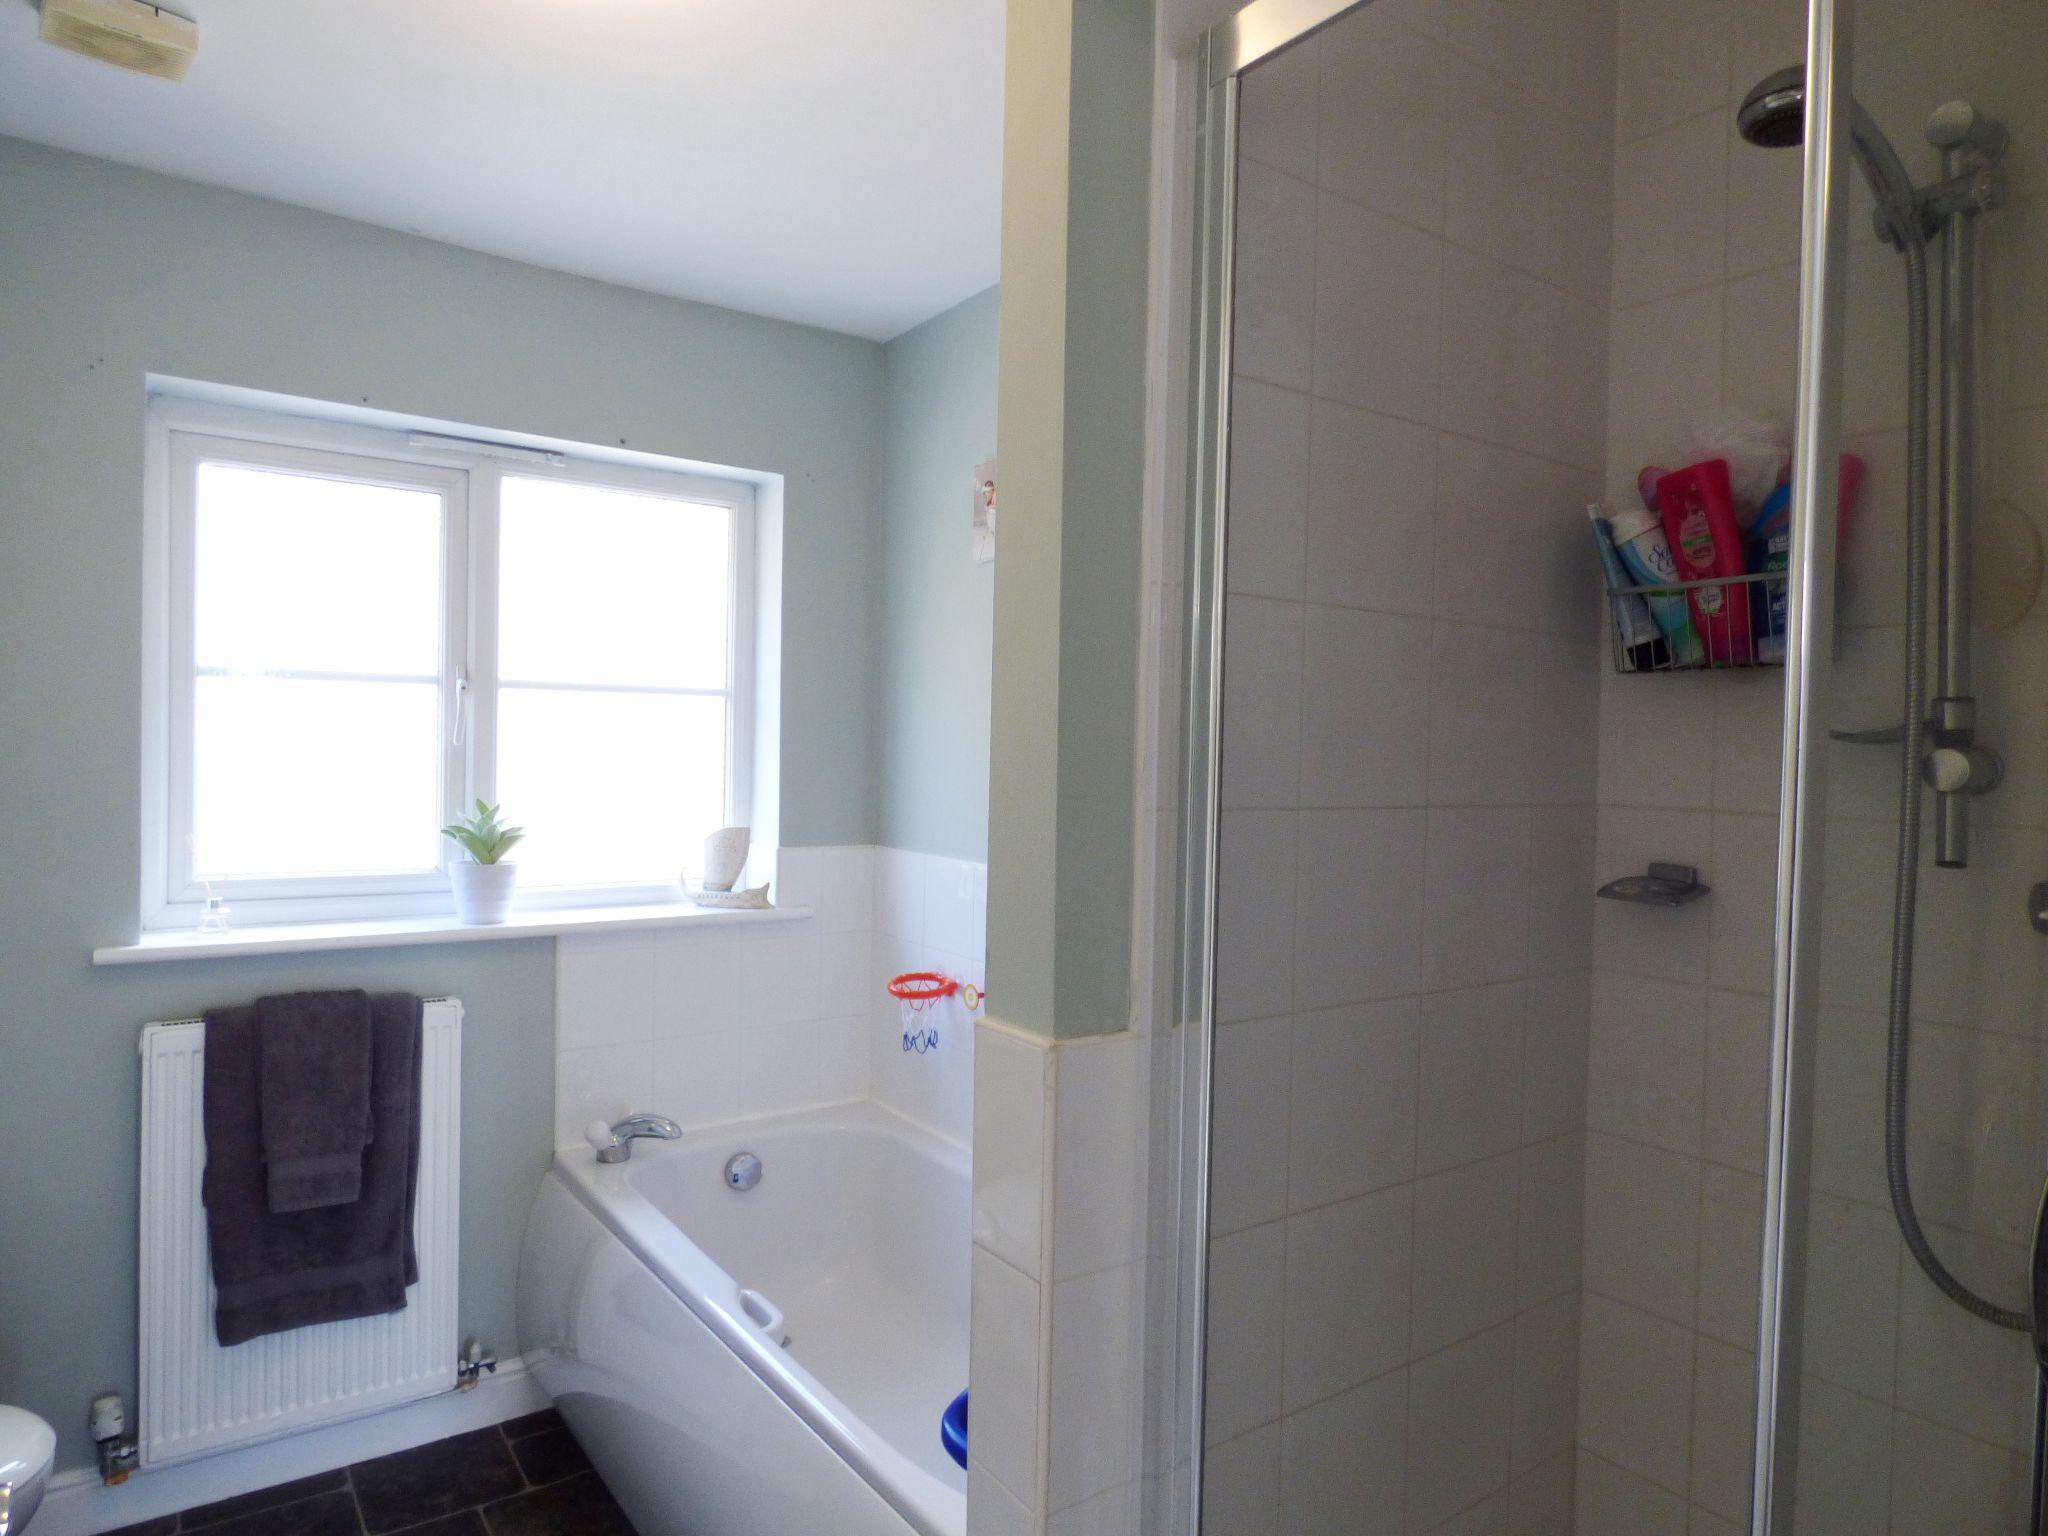 4 Bedroom Semi-detached House For Sale - Main Bathroom